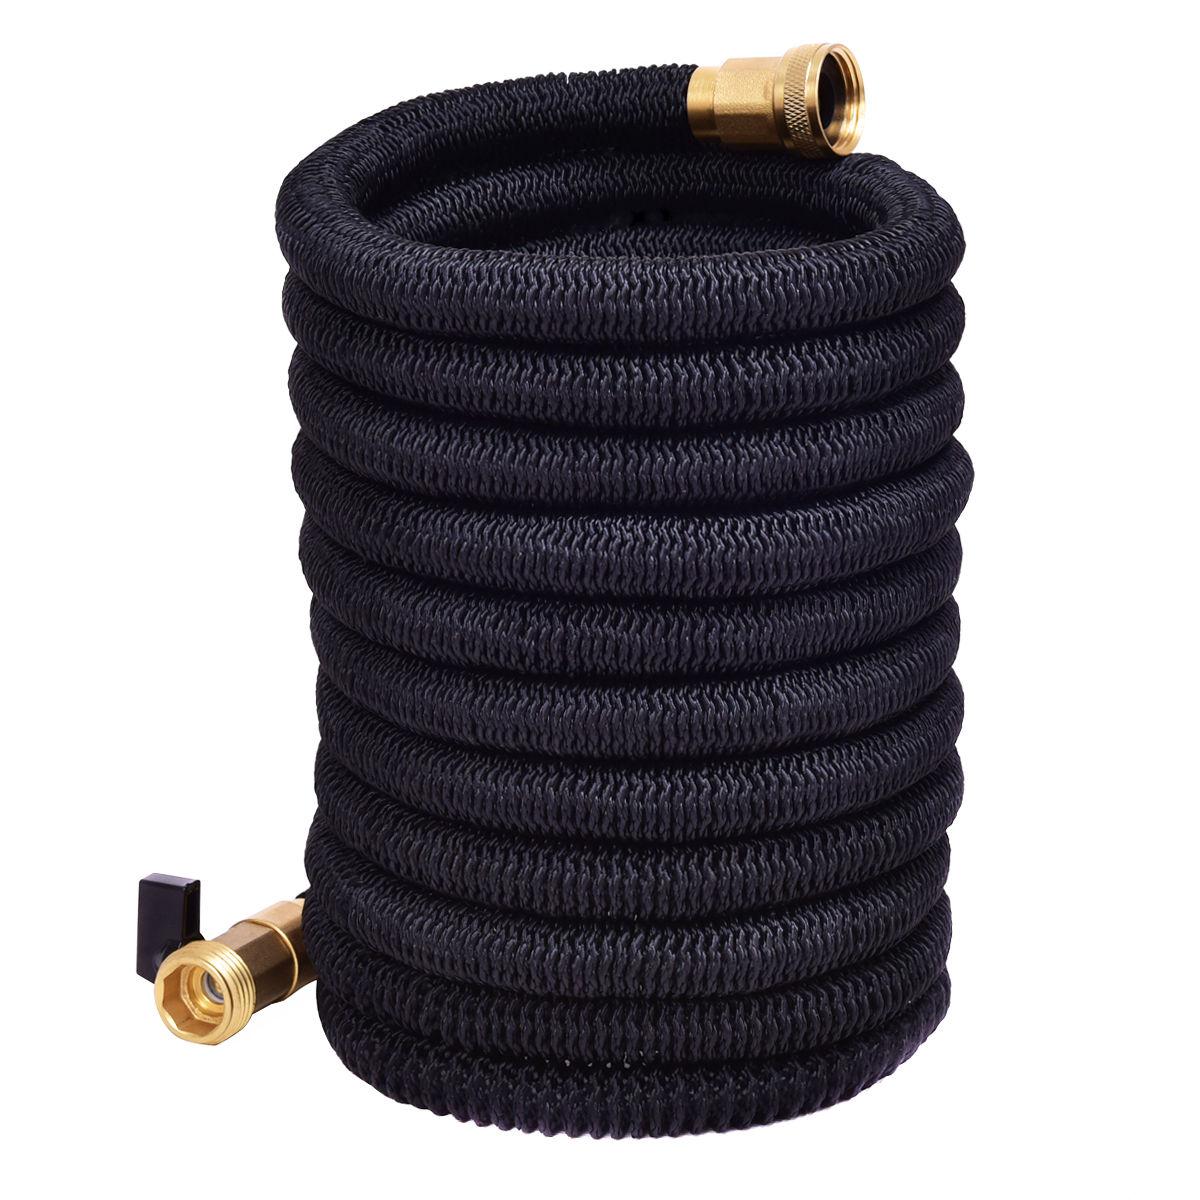 Costway 50FT Expanding Flexible Water Hose Pipe Home Garden Hose Watering Black